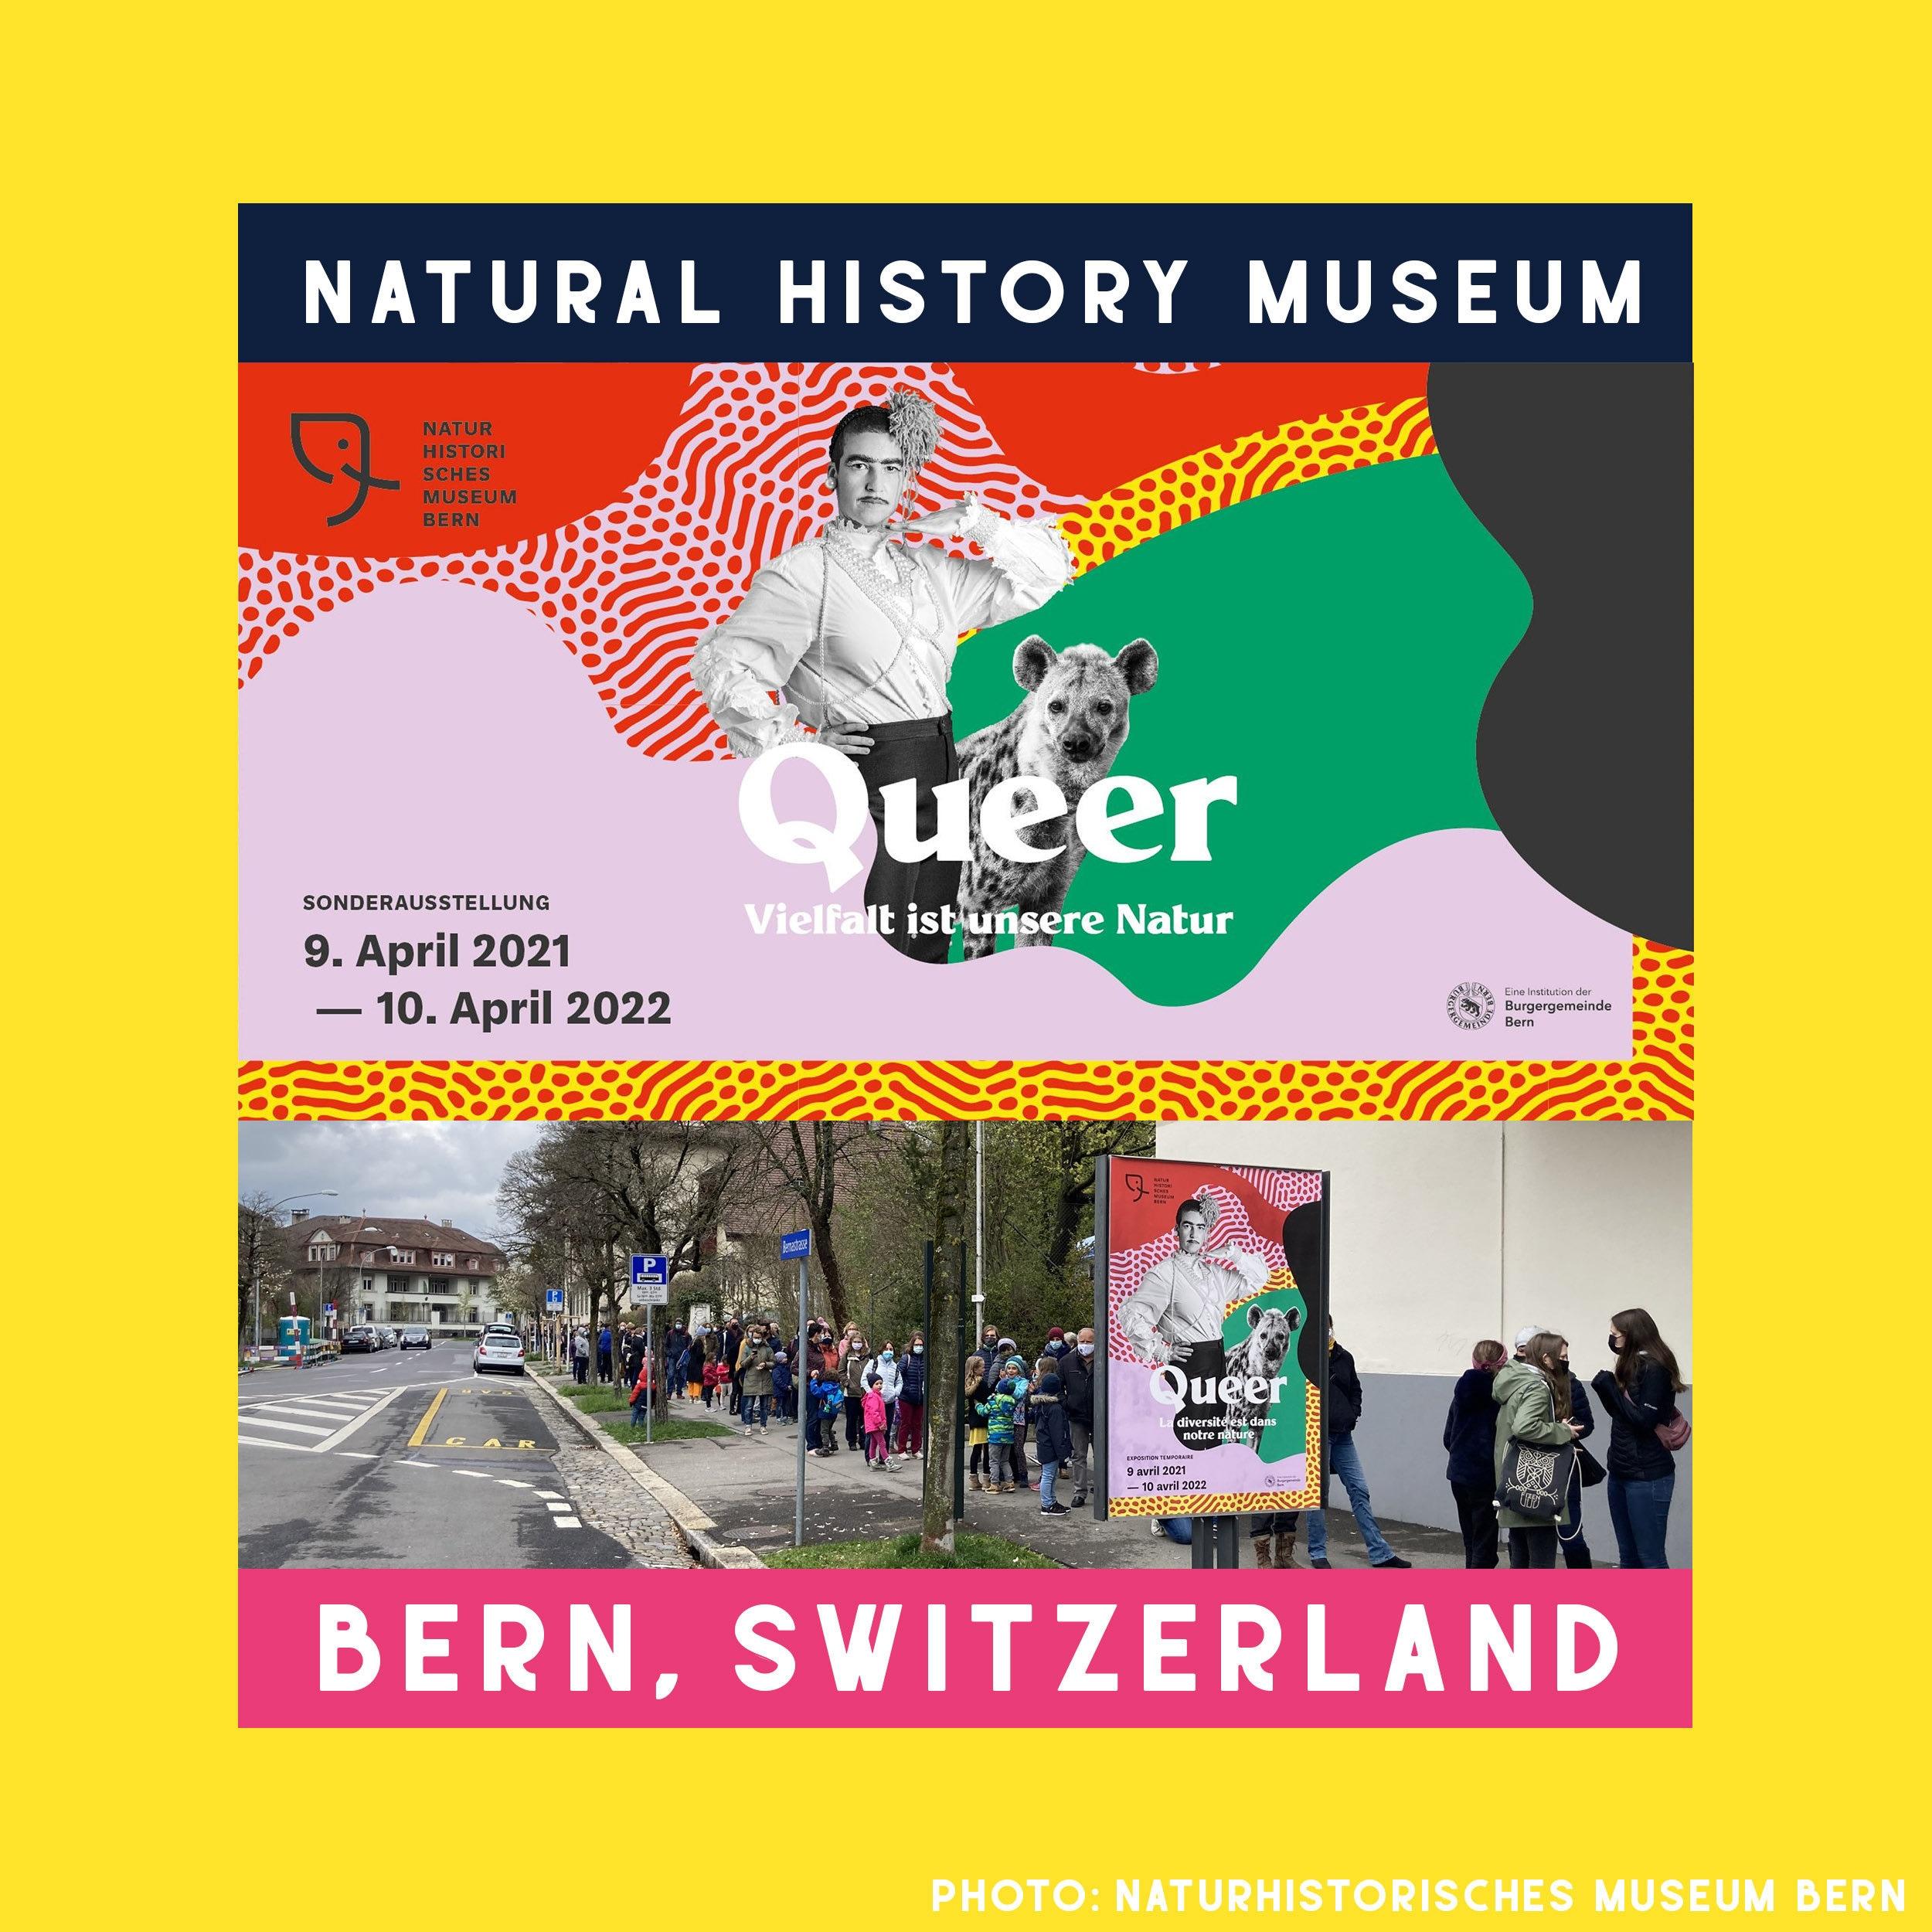 Natural History Museum of Bern The Pin Prick Museum Shop Switzerland LGBT Merchandise